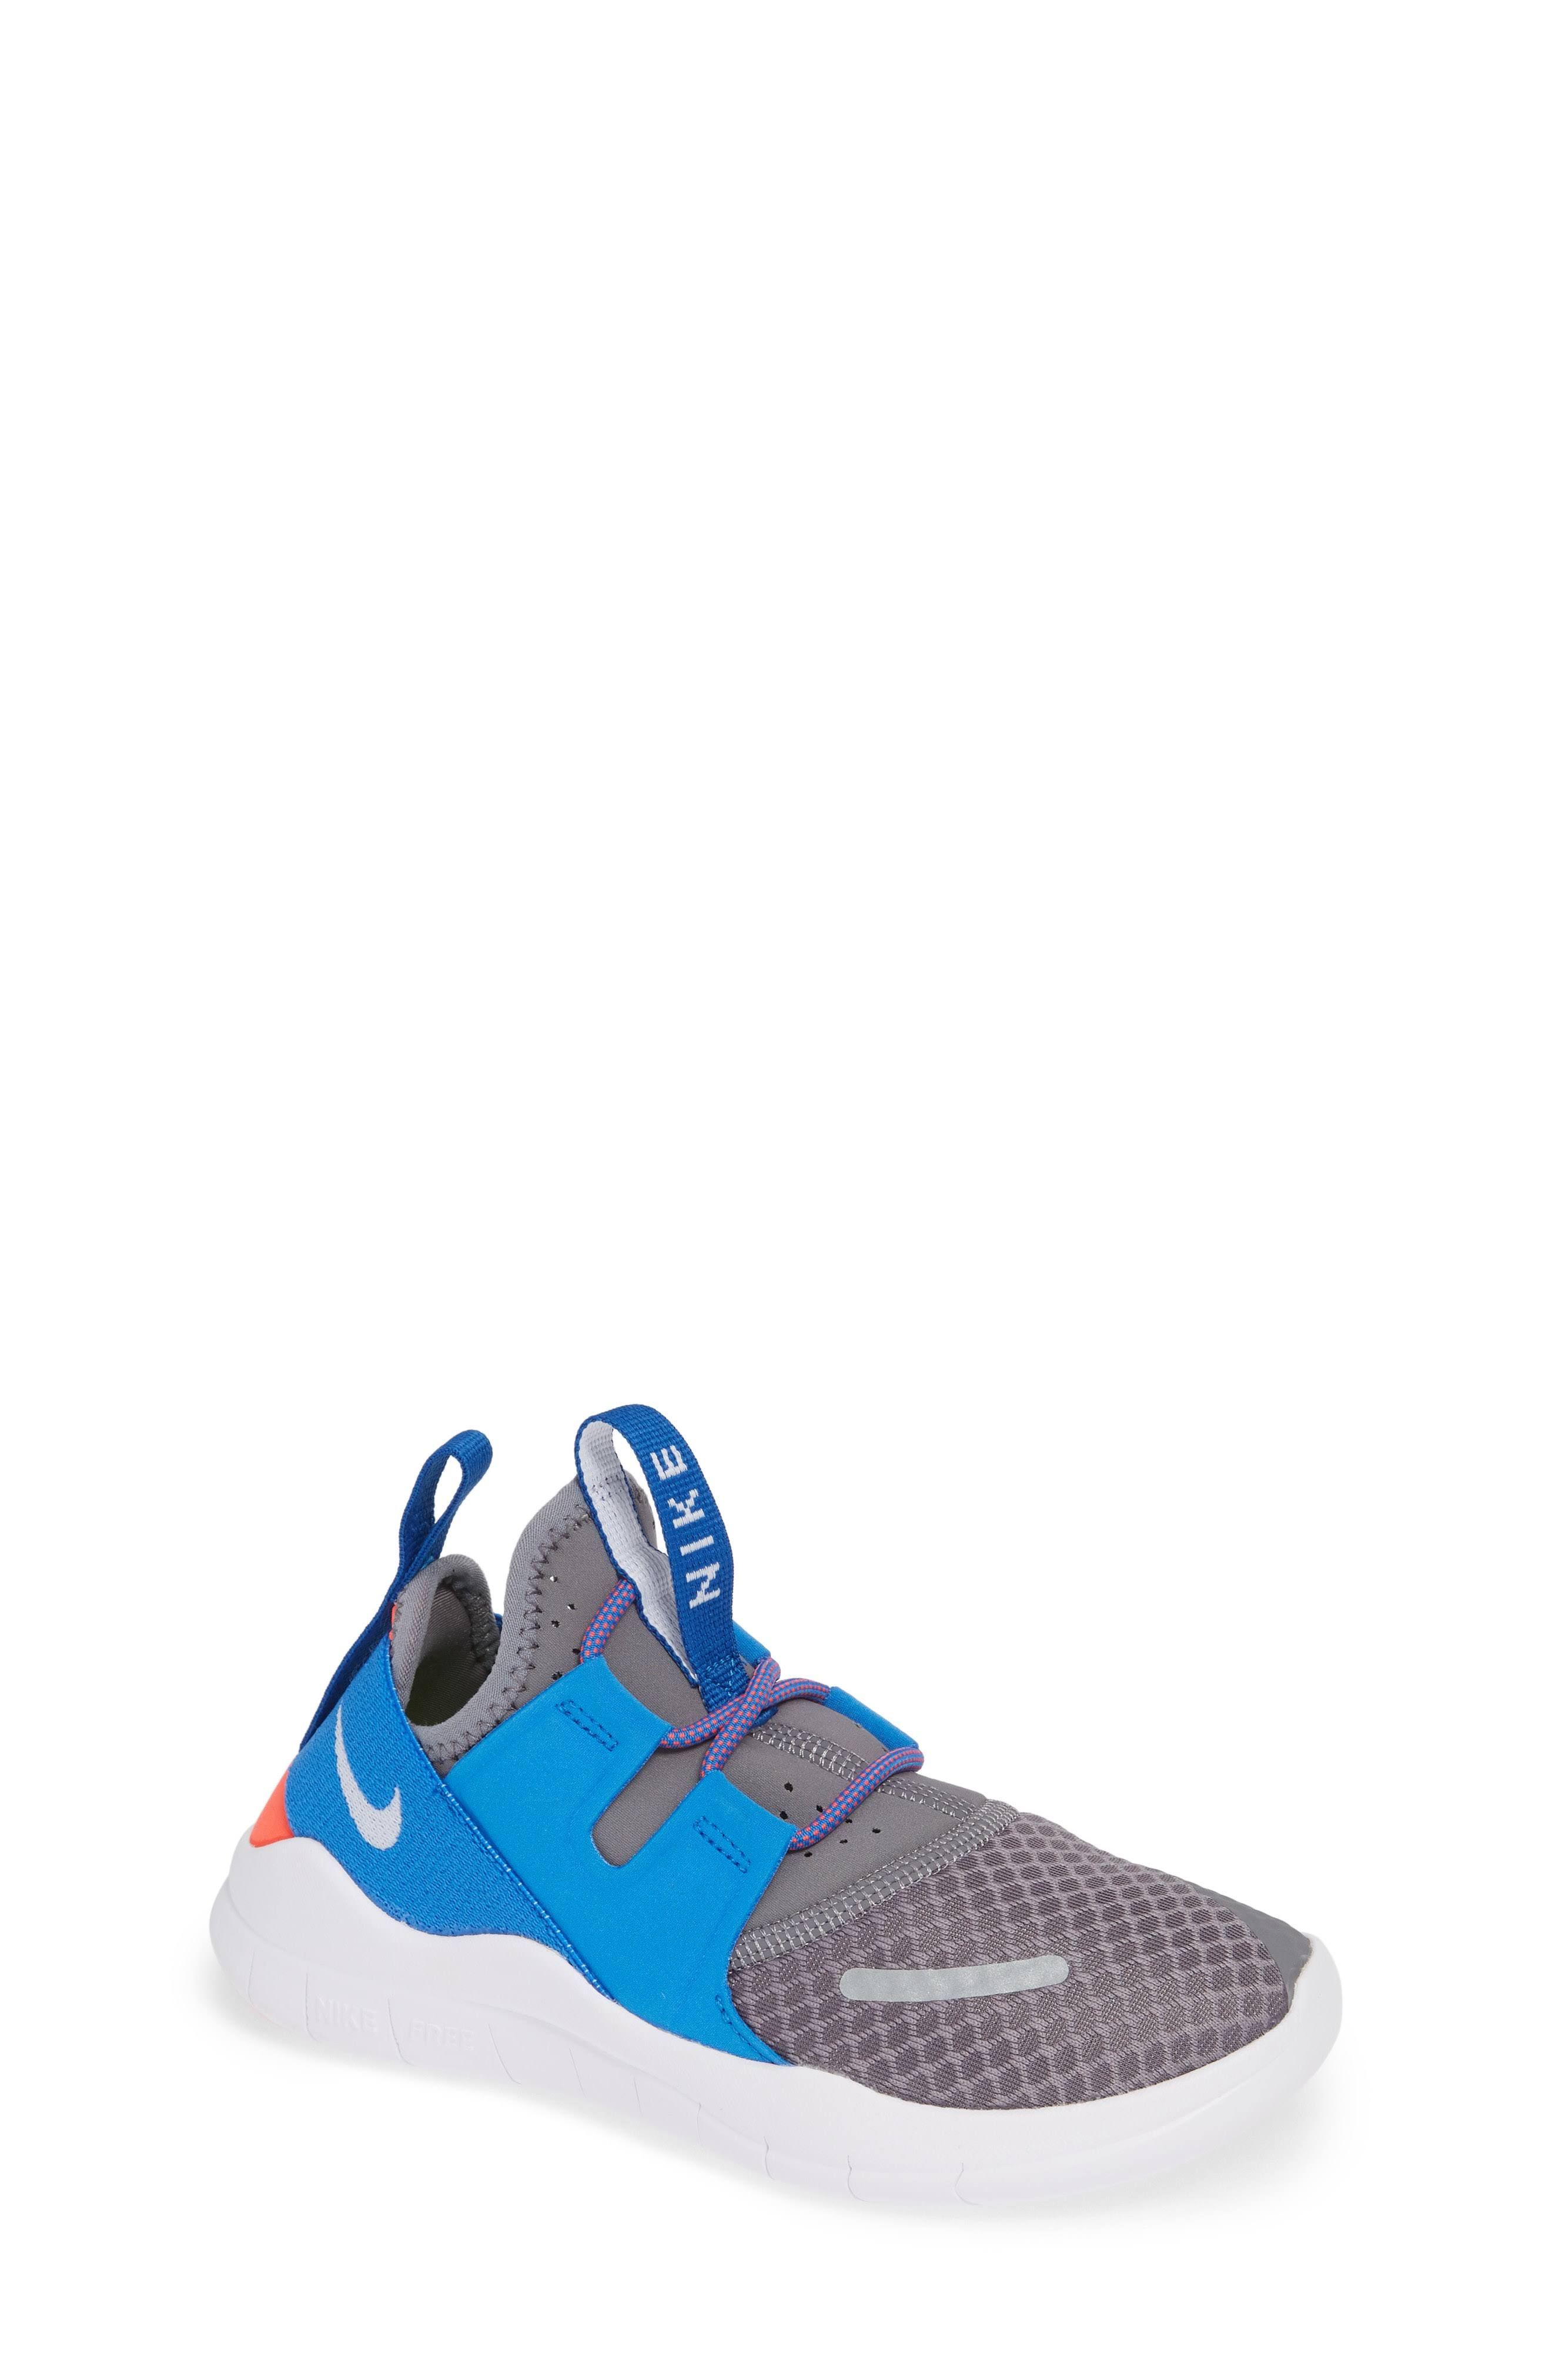 Commuter Größe Grau Für Rn 5 Nike M 4 2018 Kinder Free Laufschuh Ex7qq0Taw